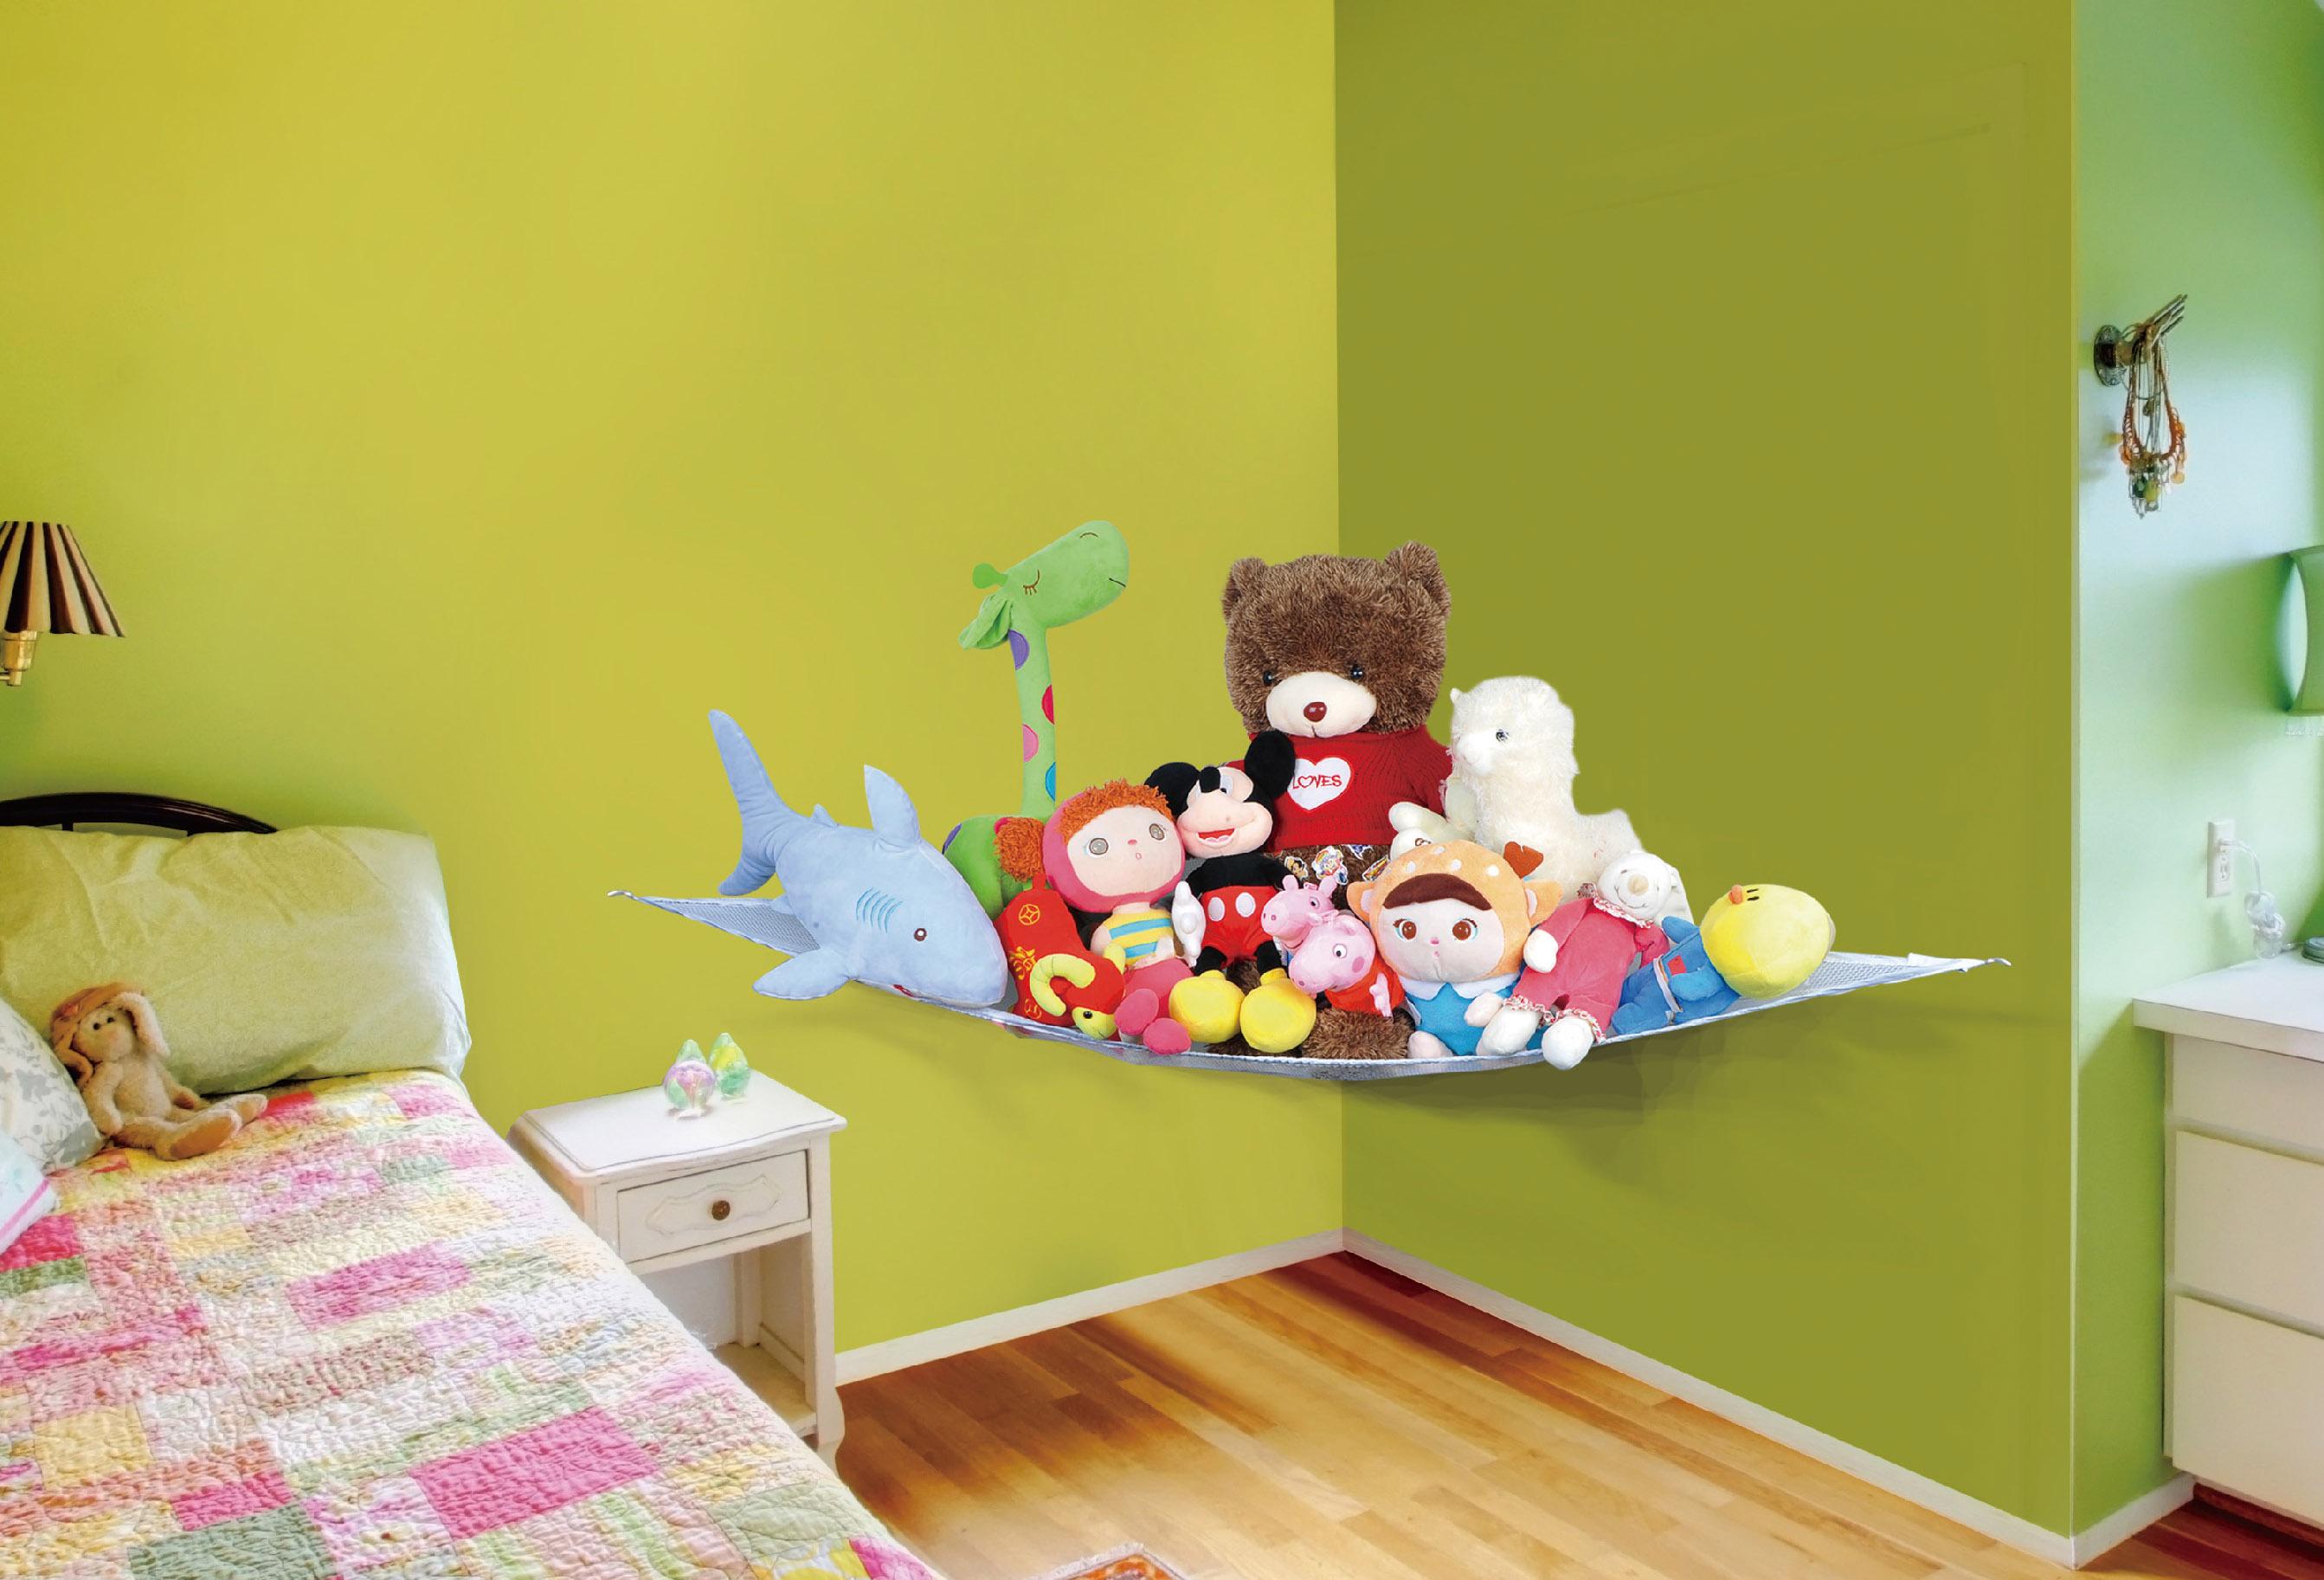 Kids Soft Toy Hammock For Bedroom Or Nursery Daniel